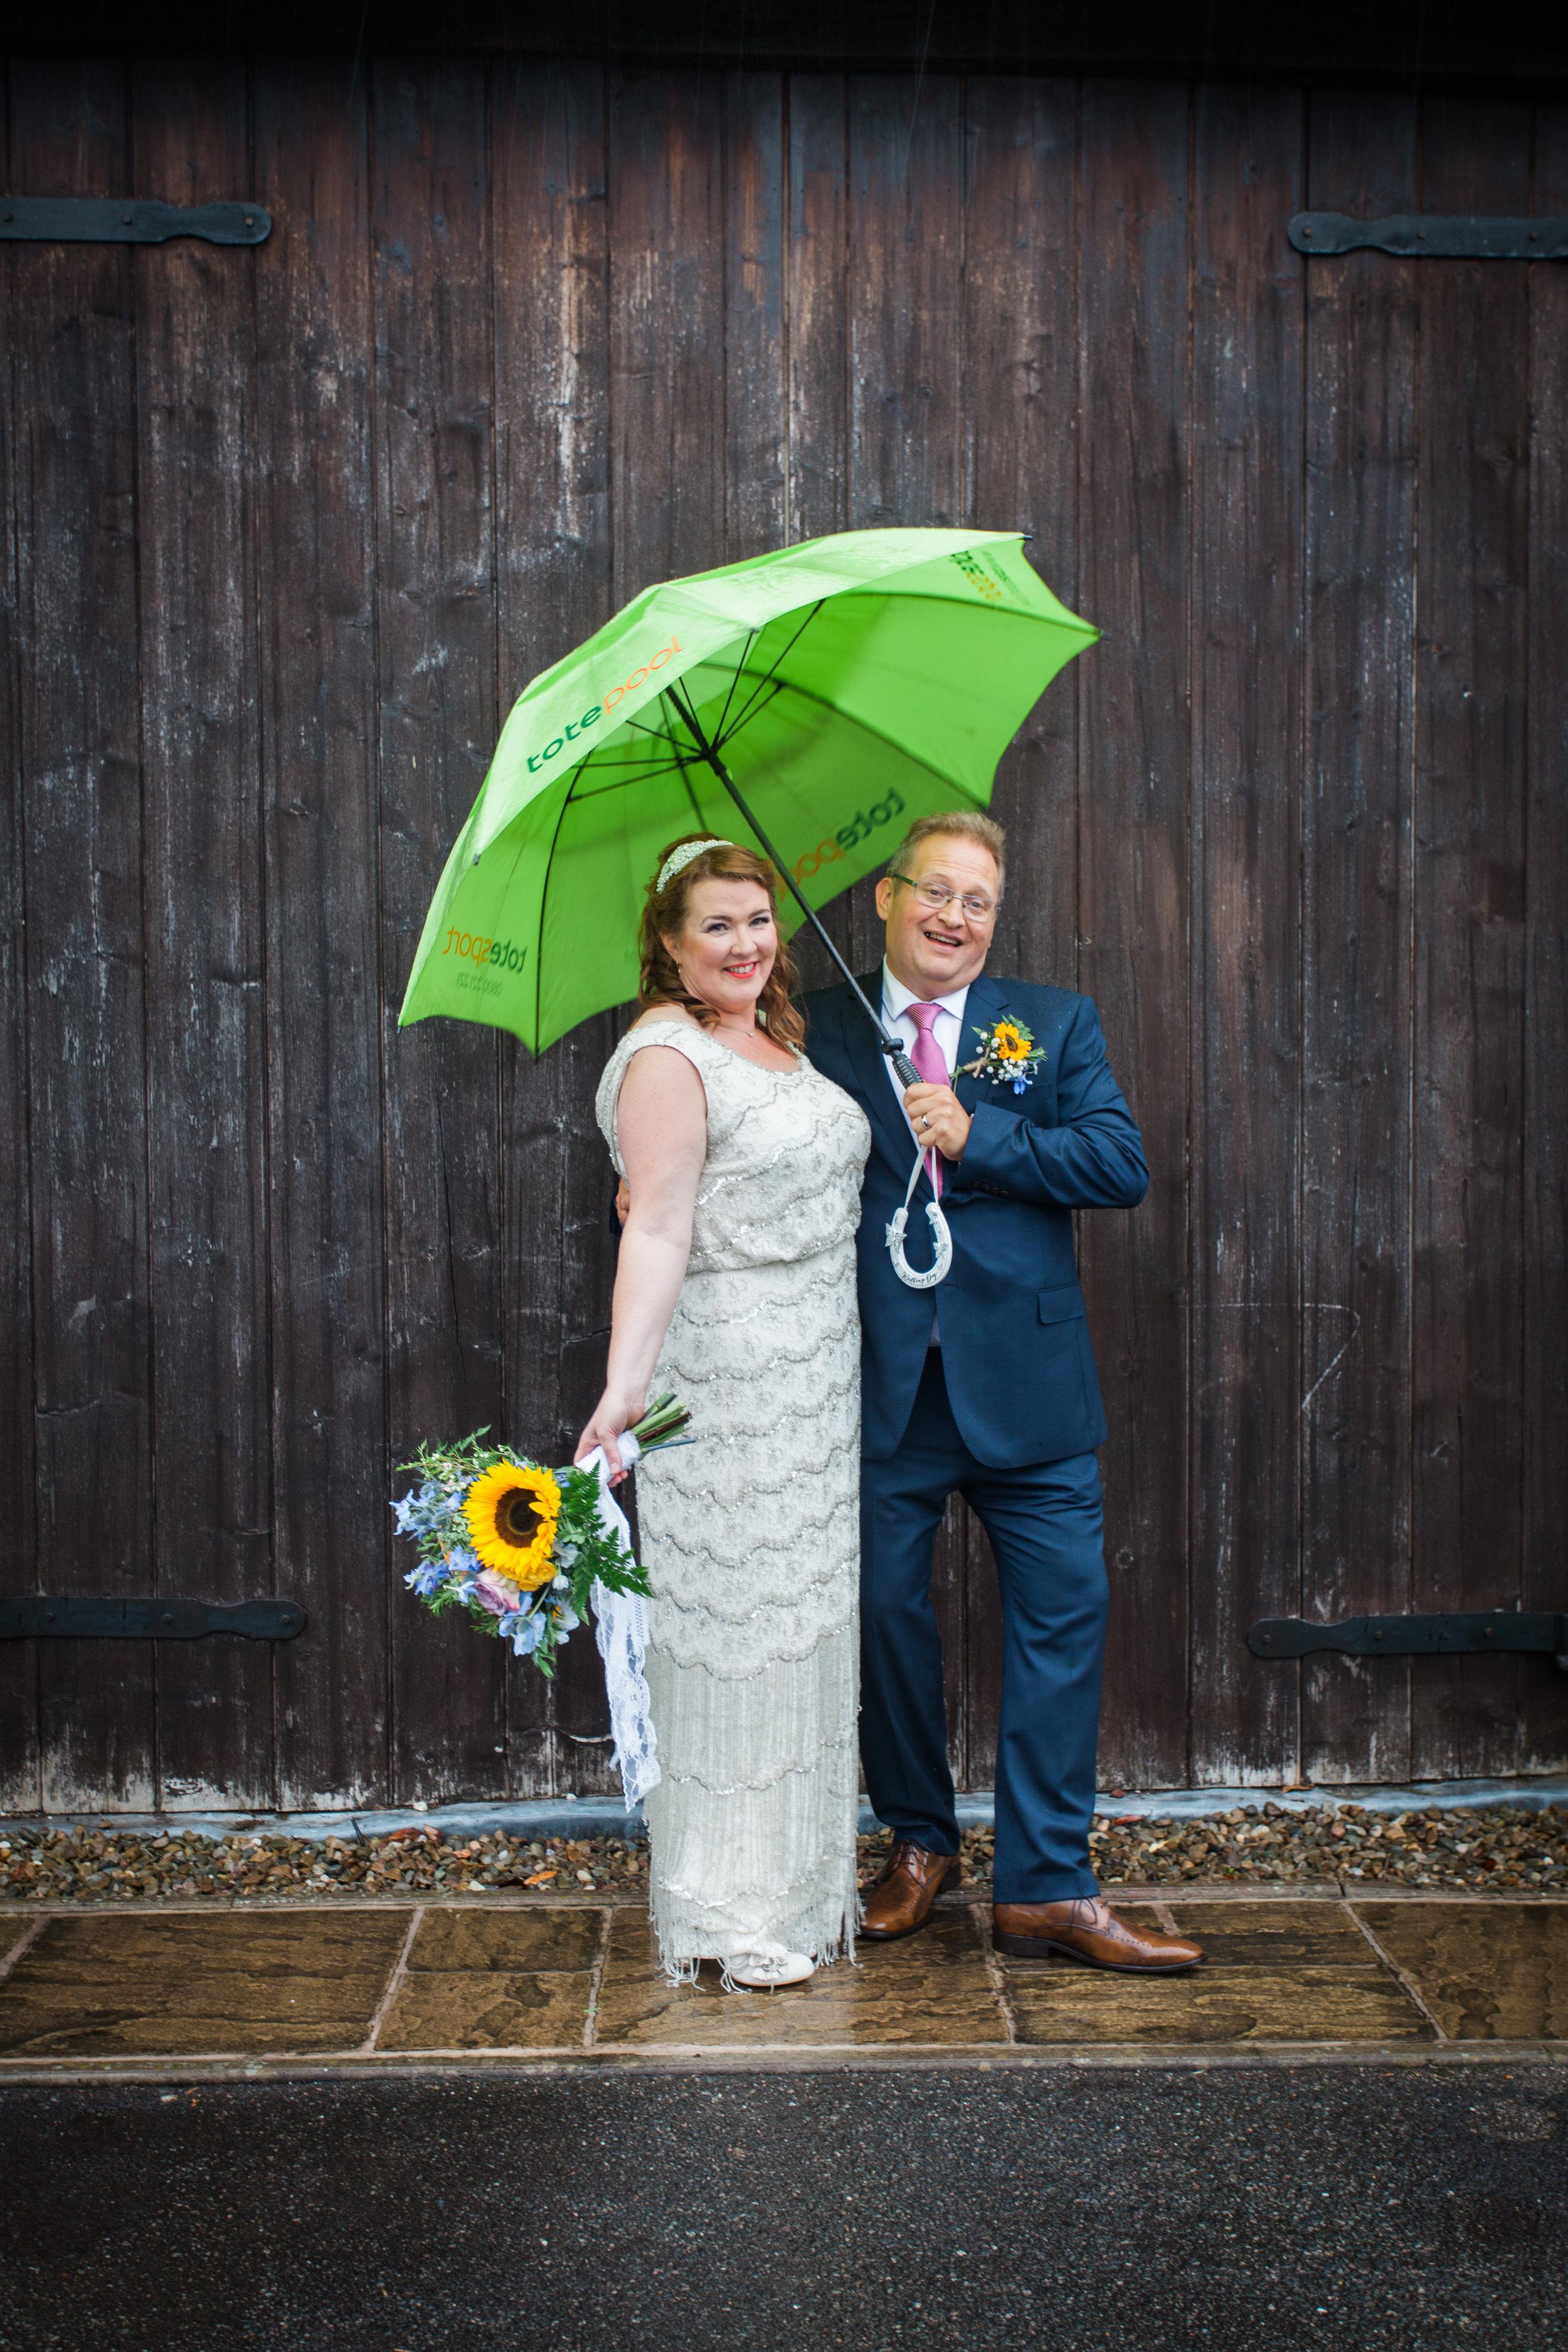 Matthew and Carol - Wedding at The Plough, Eaton.